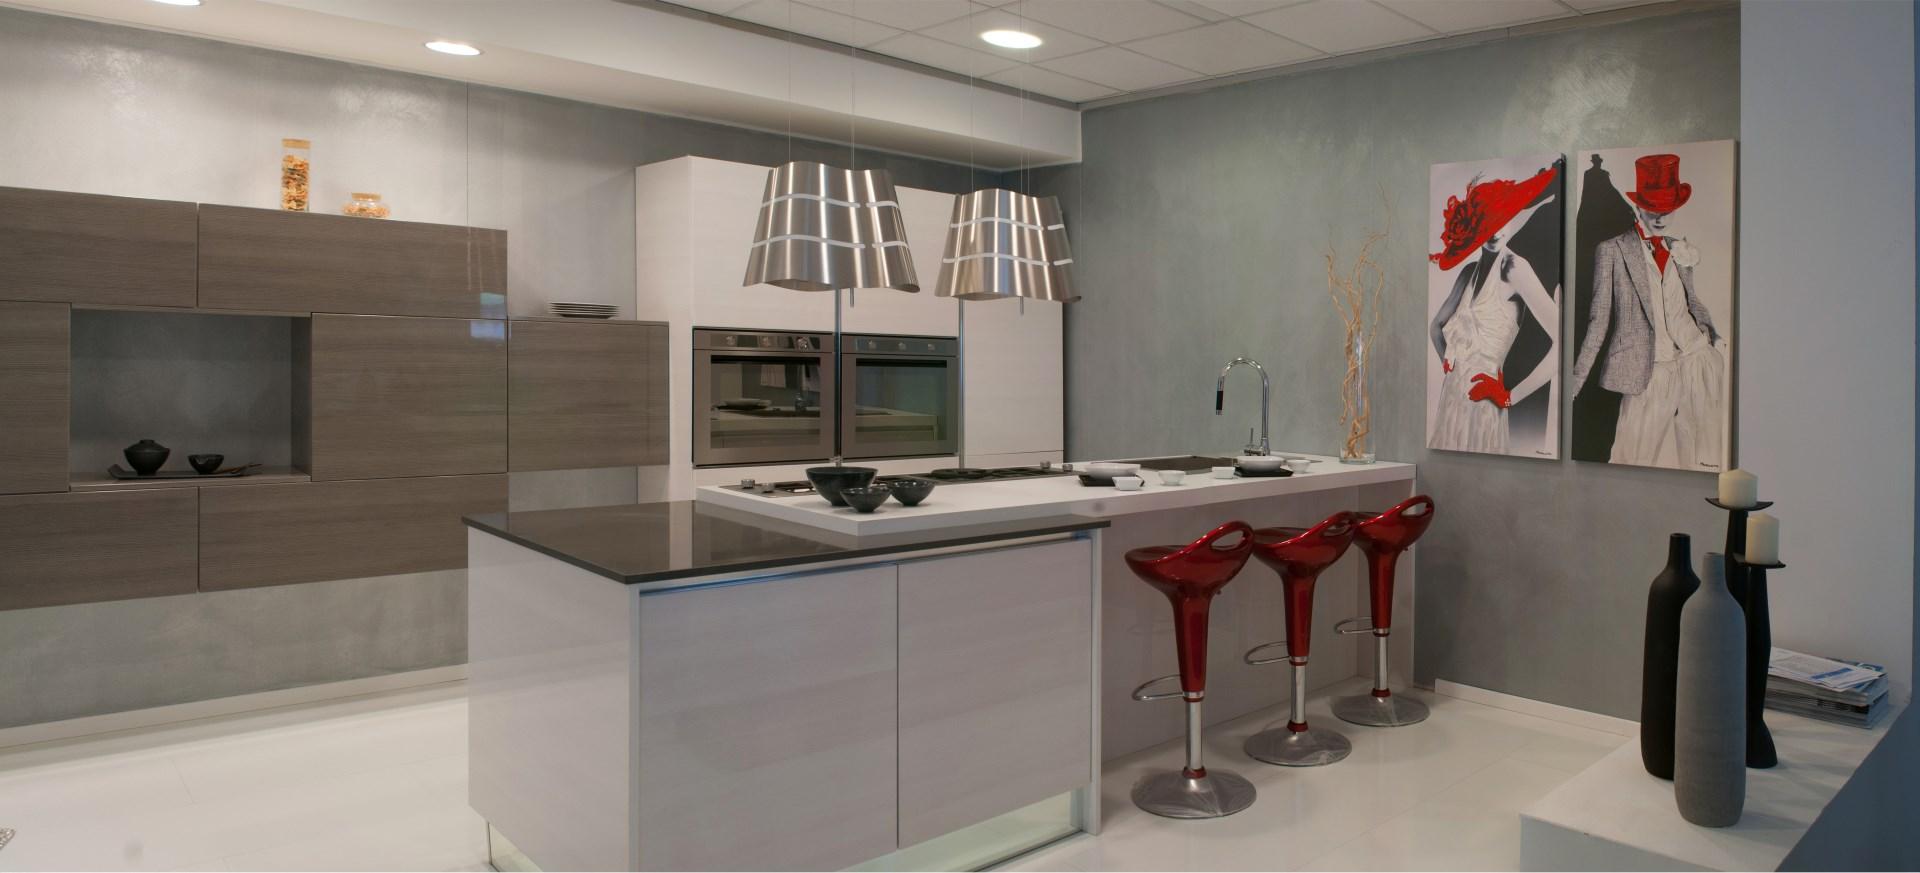 Cucina 6 - Mobilificio Dal Santo